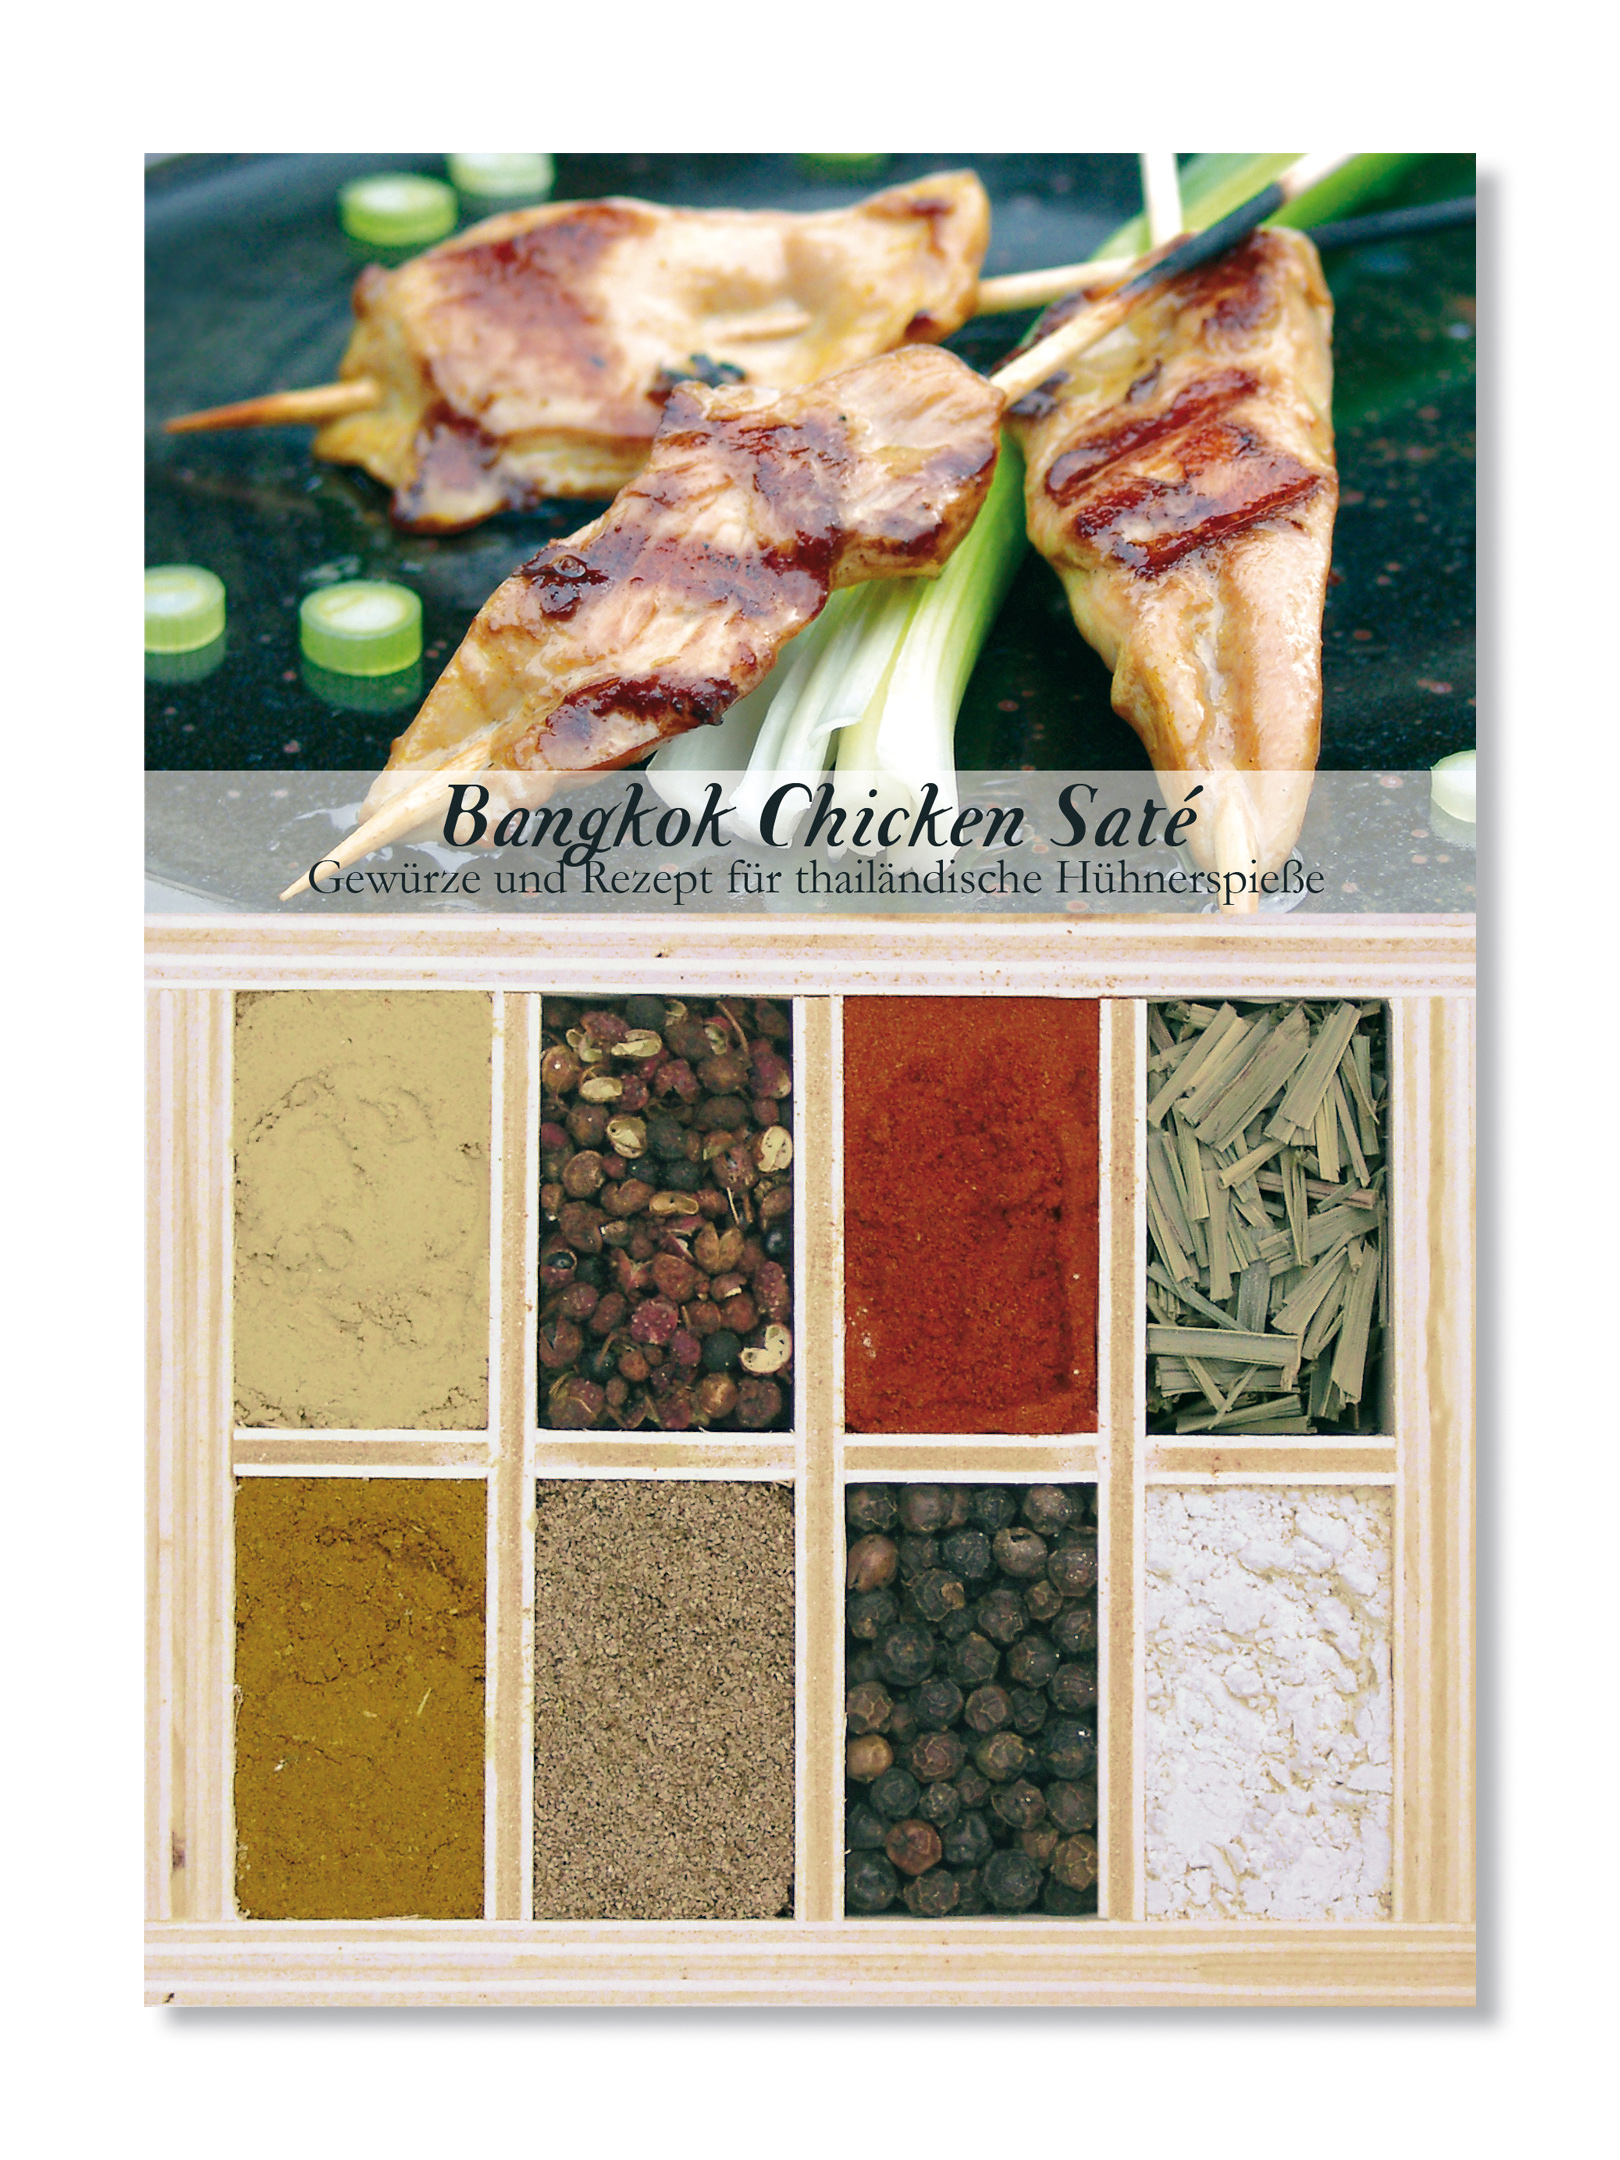 Bangkok Chicken Sate